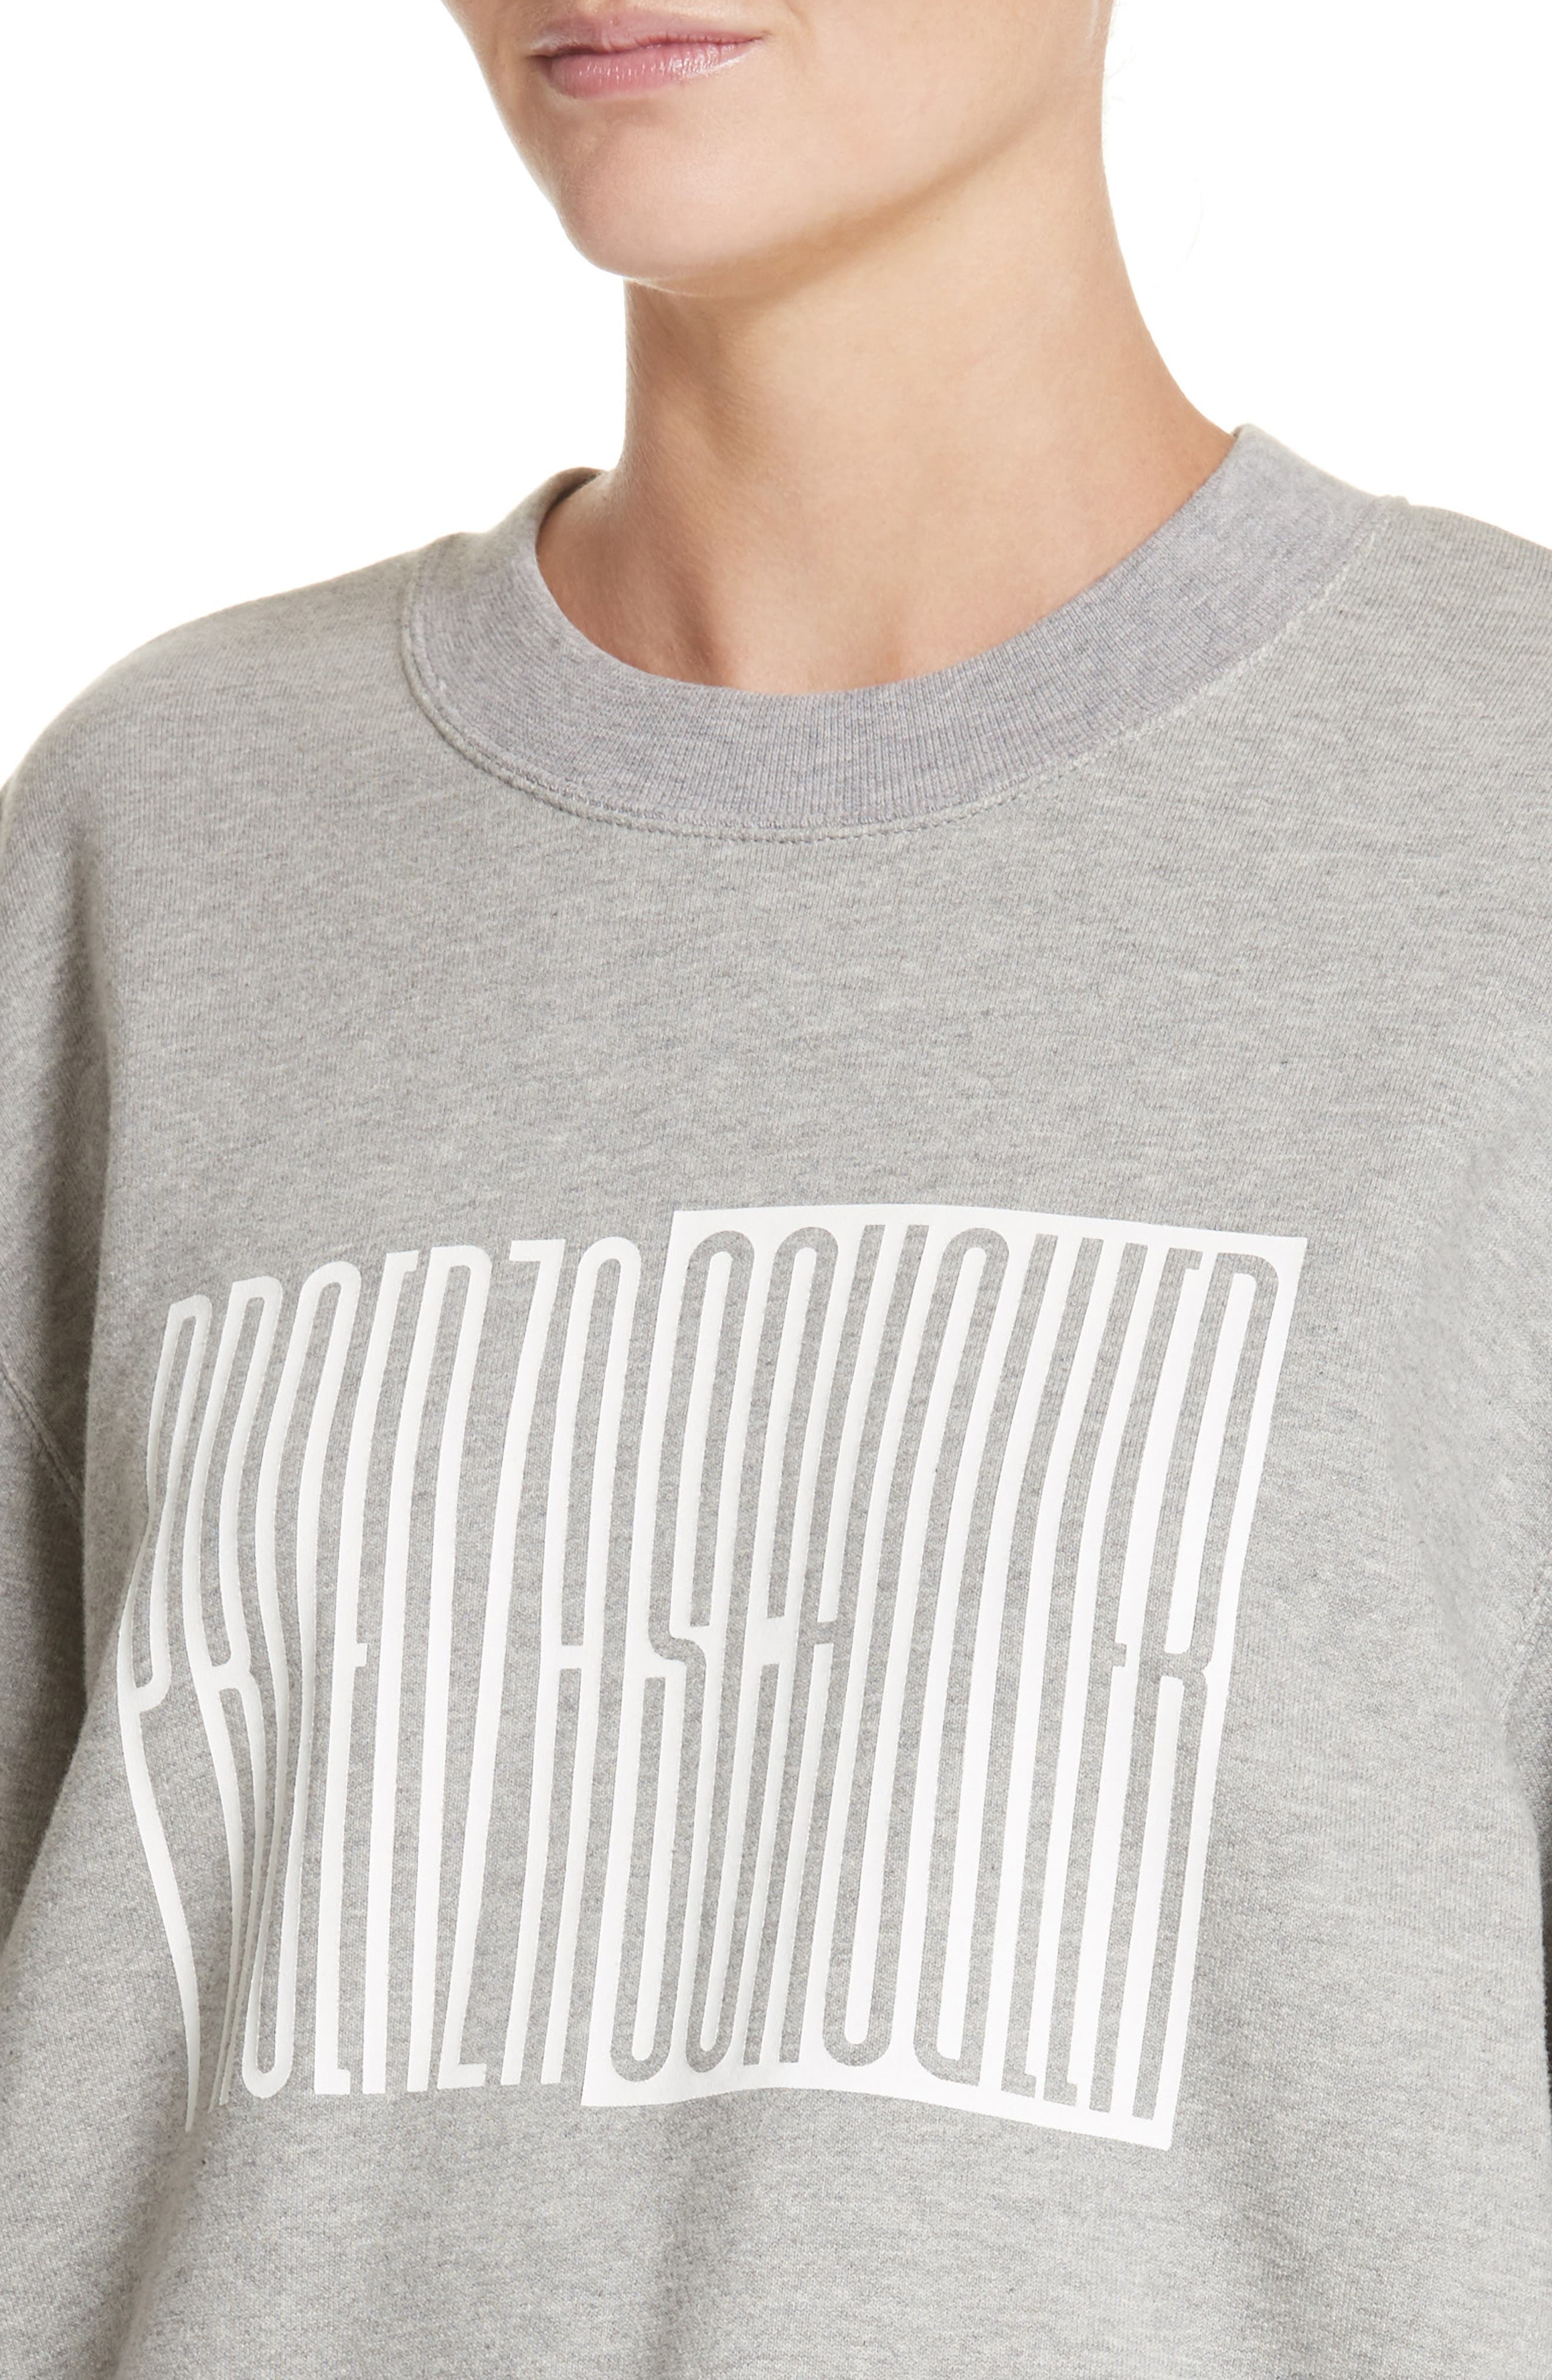 PSWL Graphic Jersey Oversize Sweatshirt,                             Alternate thumbnail 4, color,                             Grey Melange/ White Logo